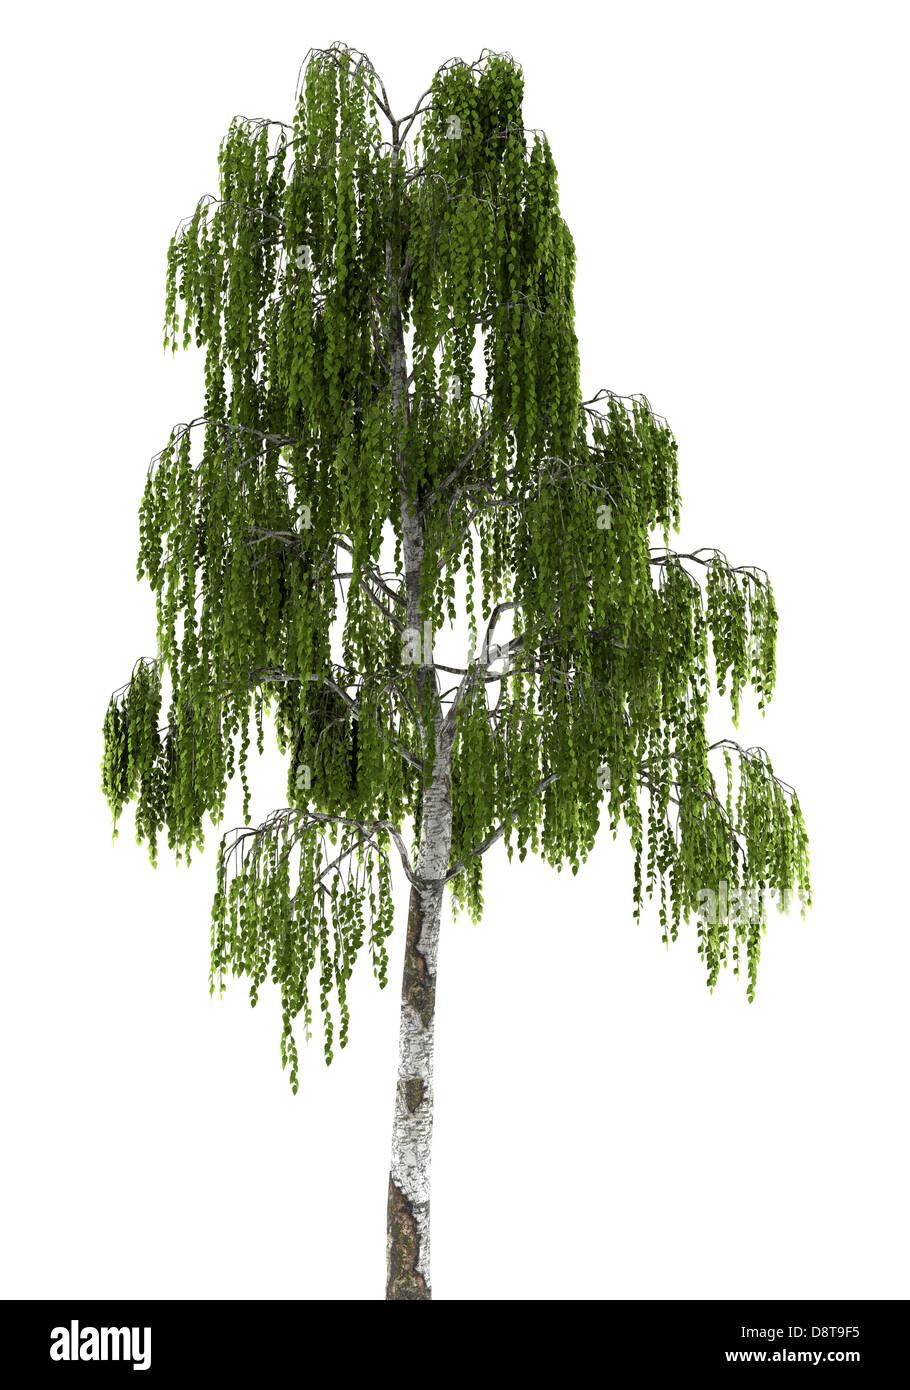 birch tree isolated on white background - Stock Image